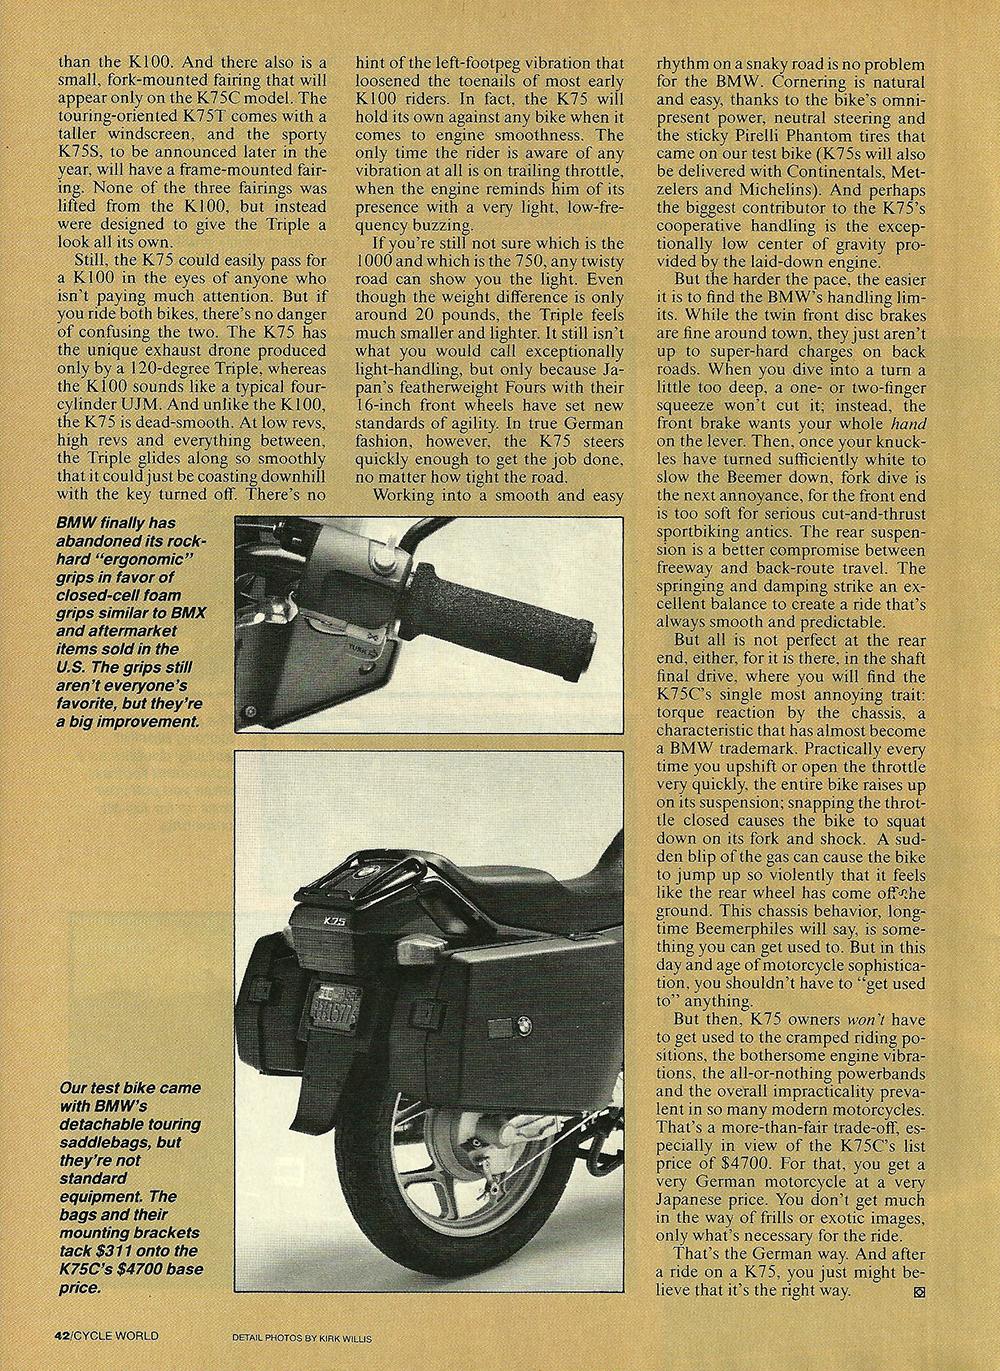 1986 BMW k75c road test 05.jpg